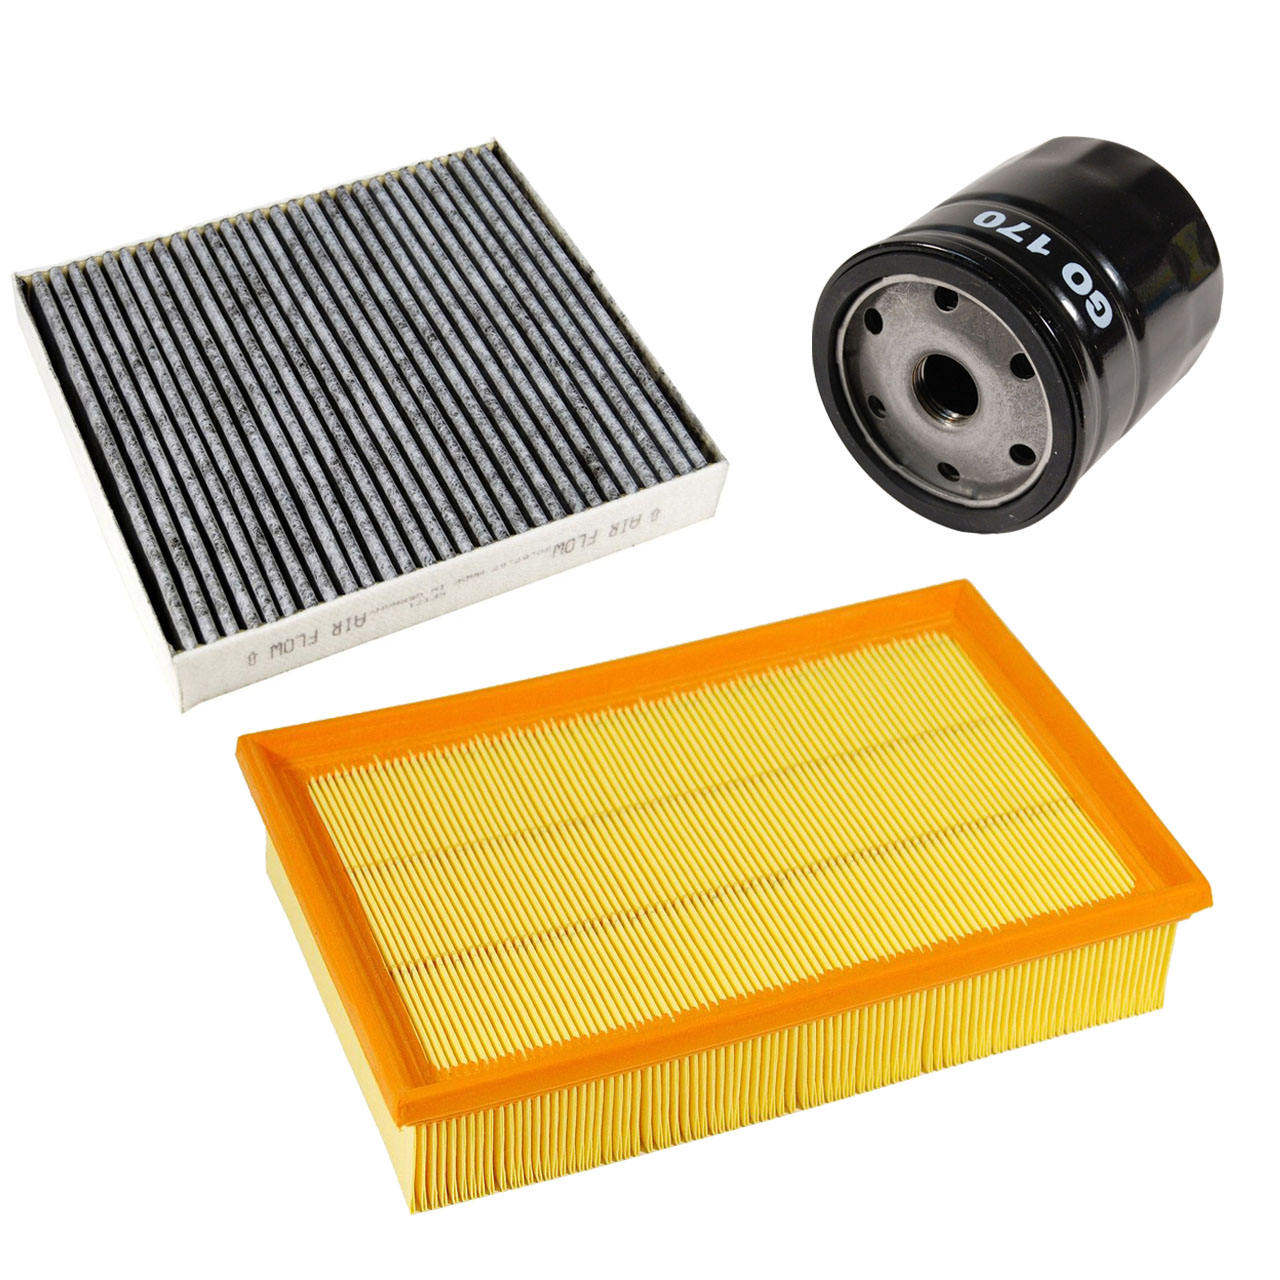 Filterpaket Filterset für Ford Focus C-Max 1.8 120-125 PS 2.0 145 PS